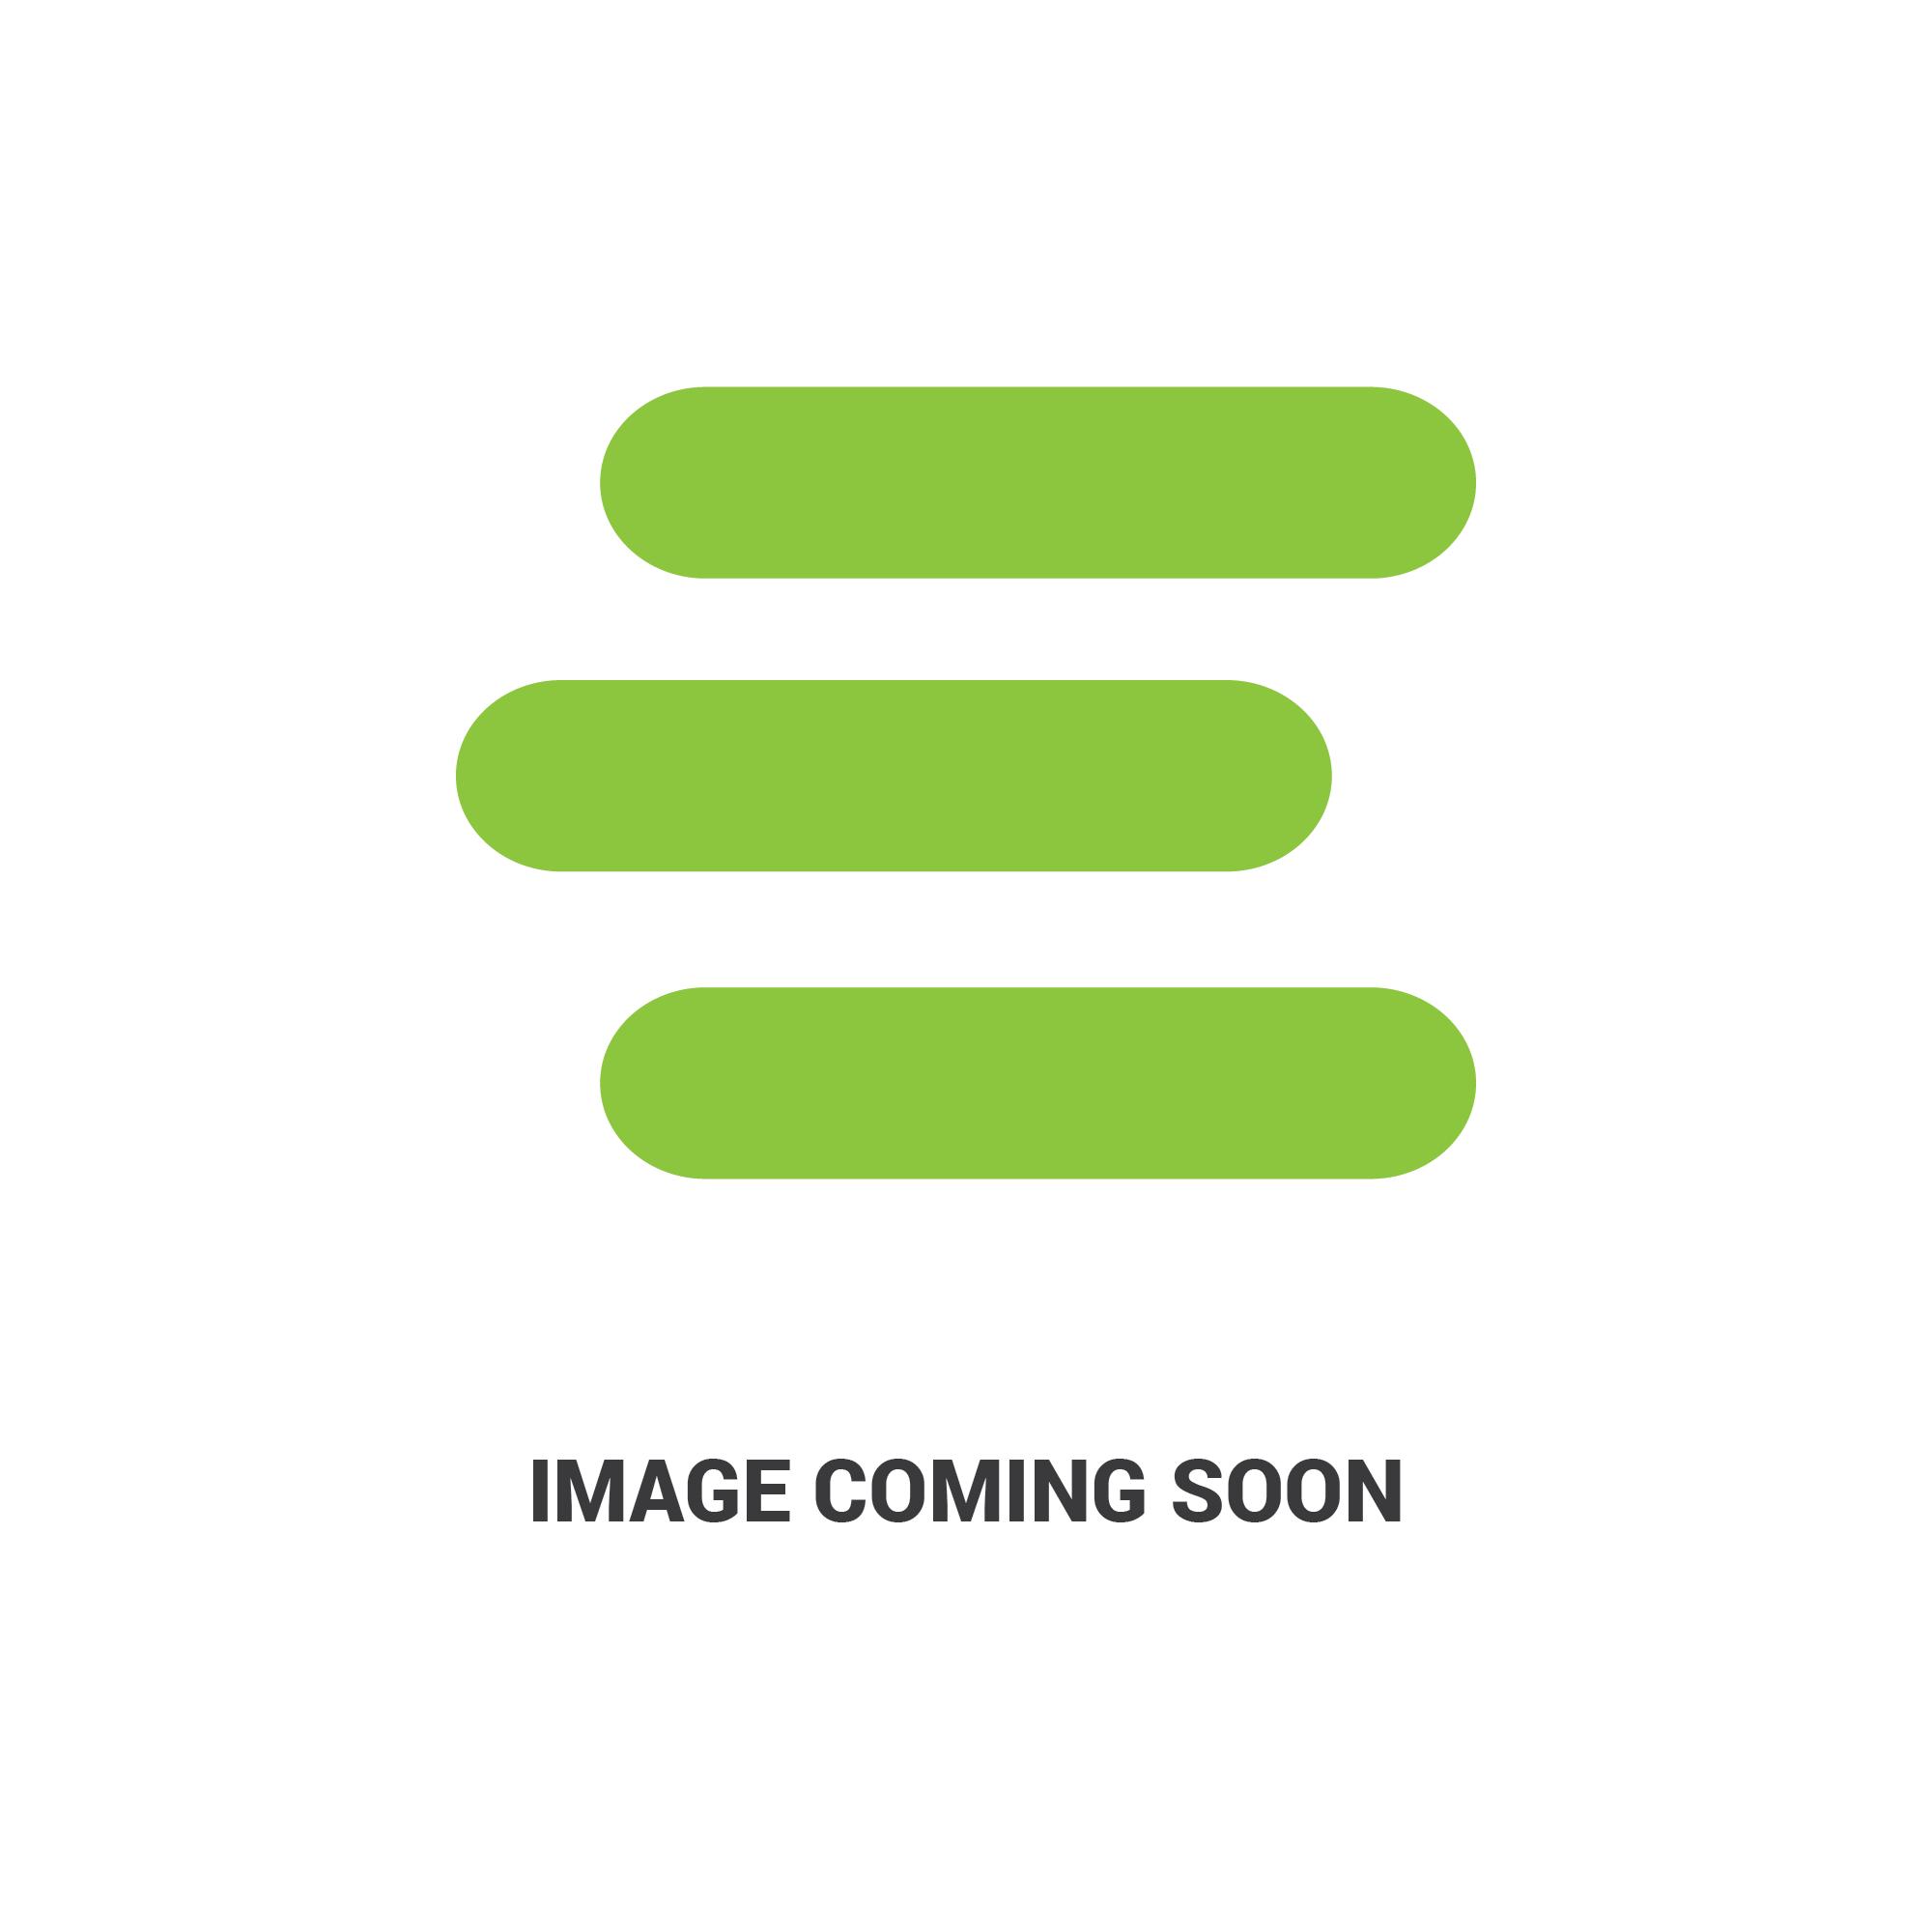 E-3J080-10870edit 1137.jpg